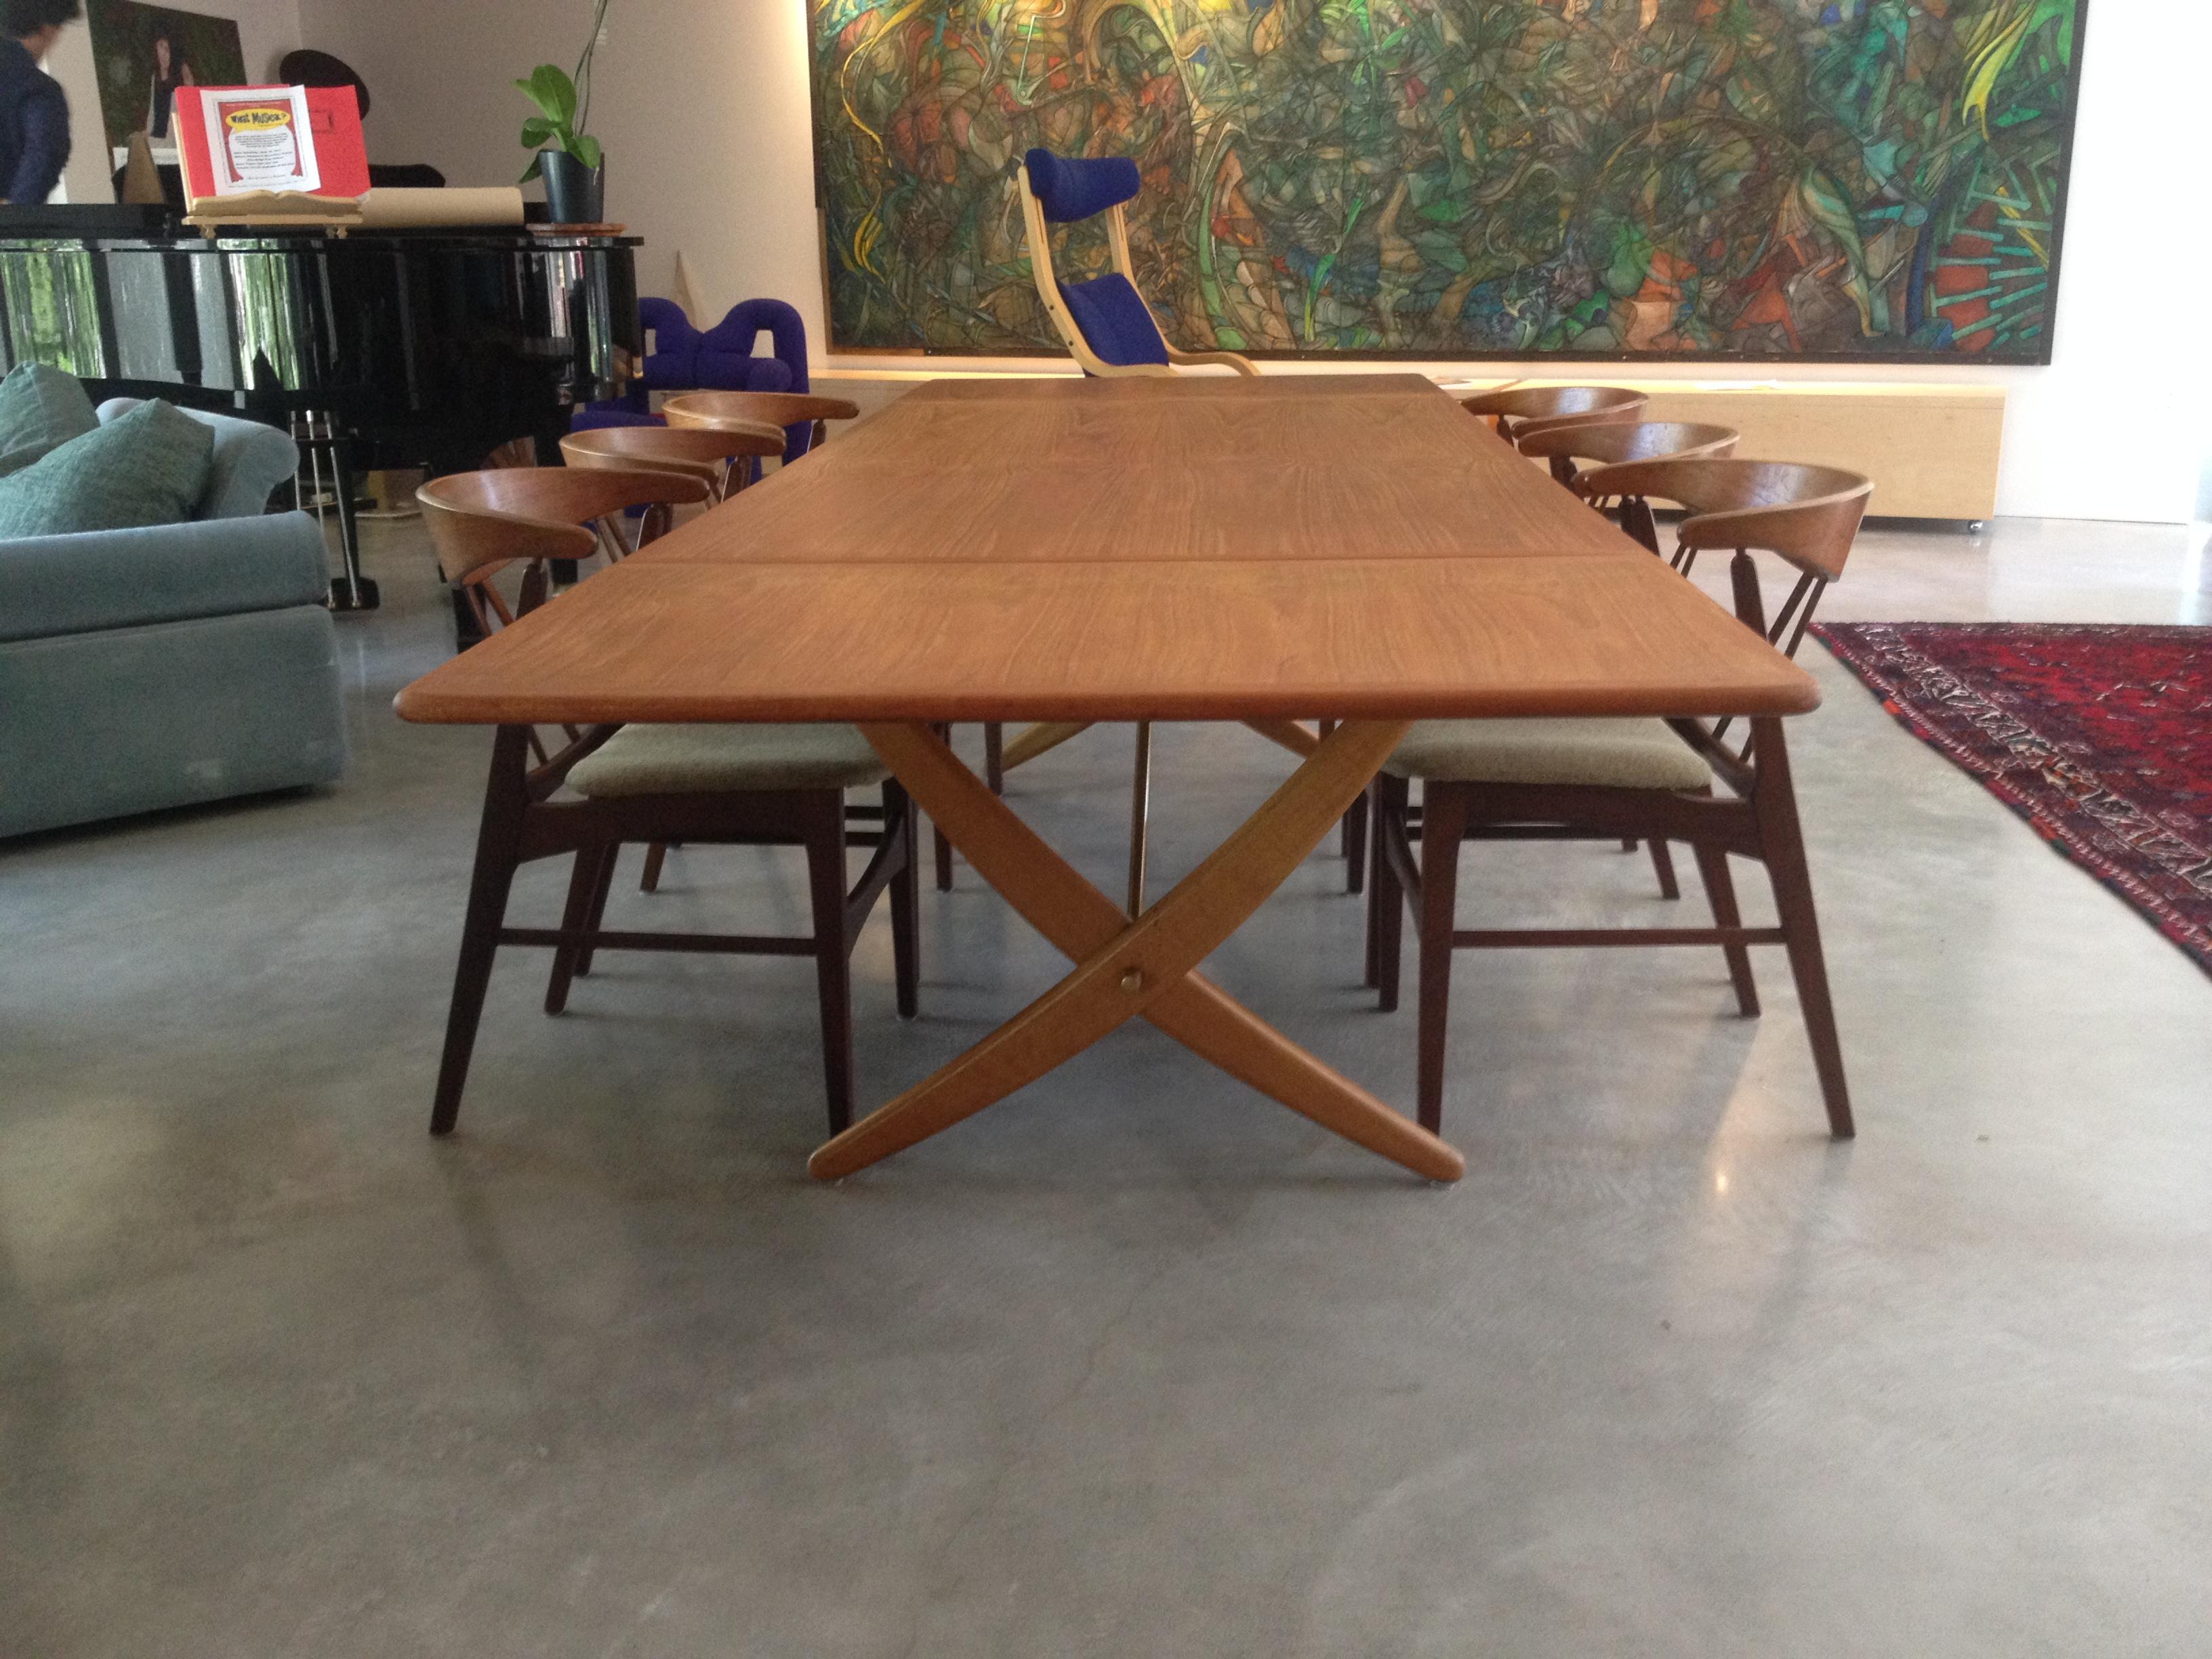 Rare Hans Wegner dining table by Johannes Hansen Denmark  SOLD. The Fabulous Find   Mid Century Modern Furniture Showroom in